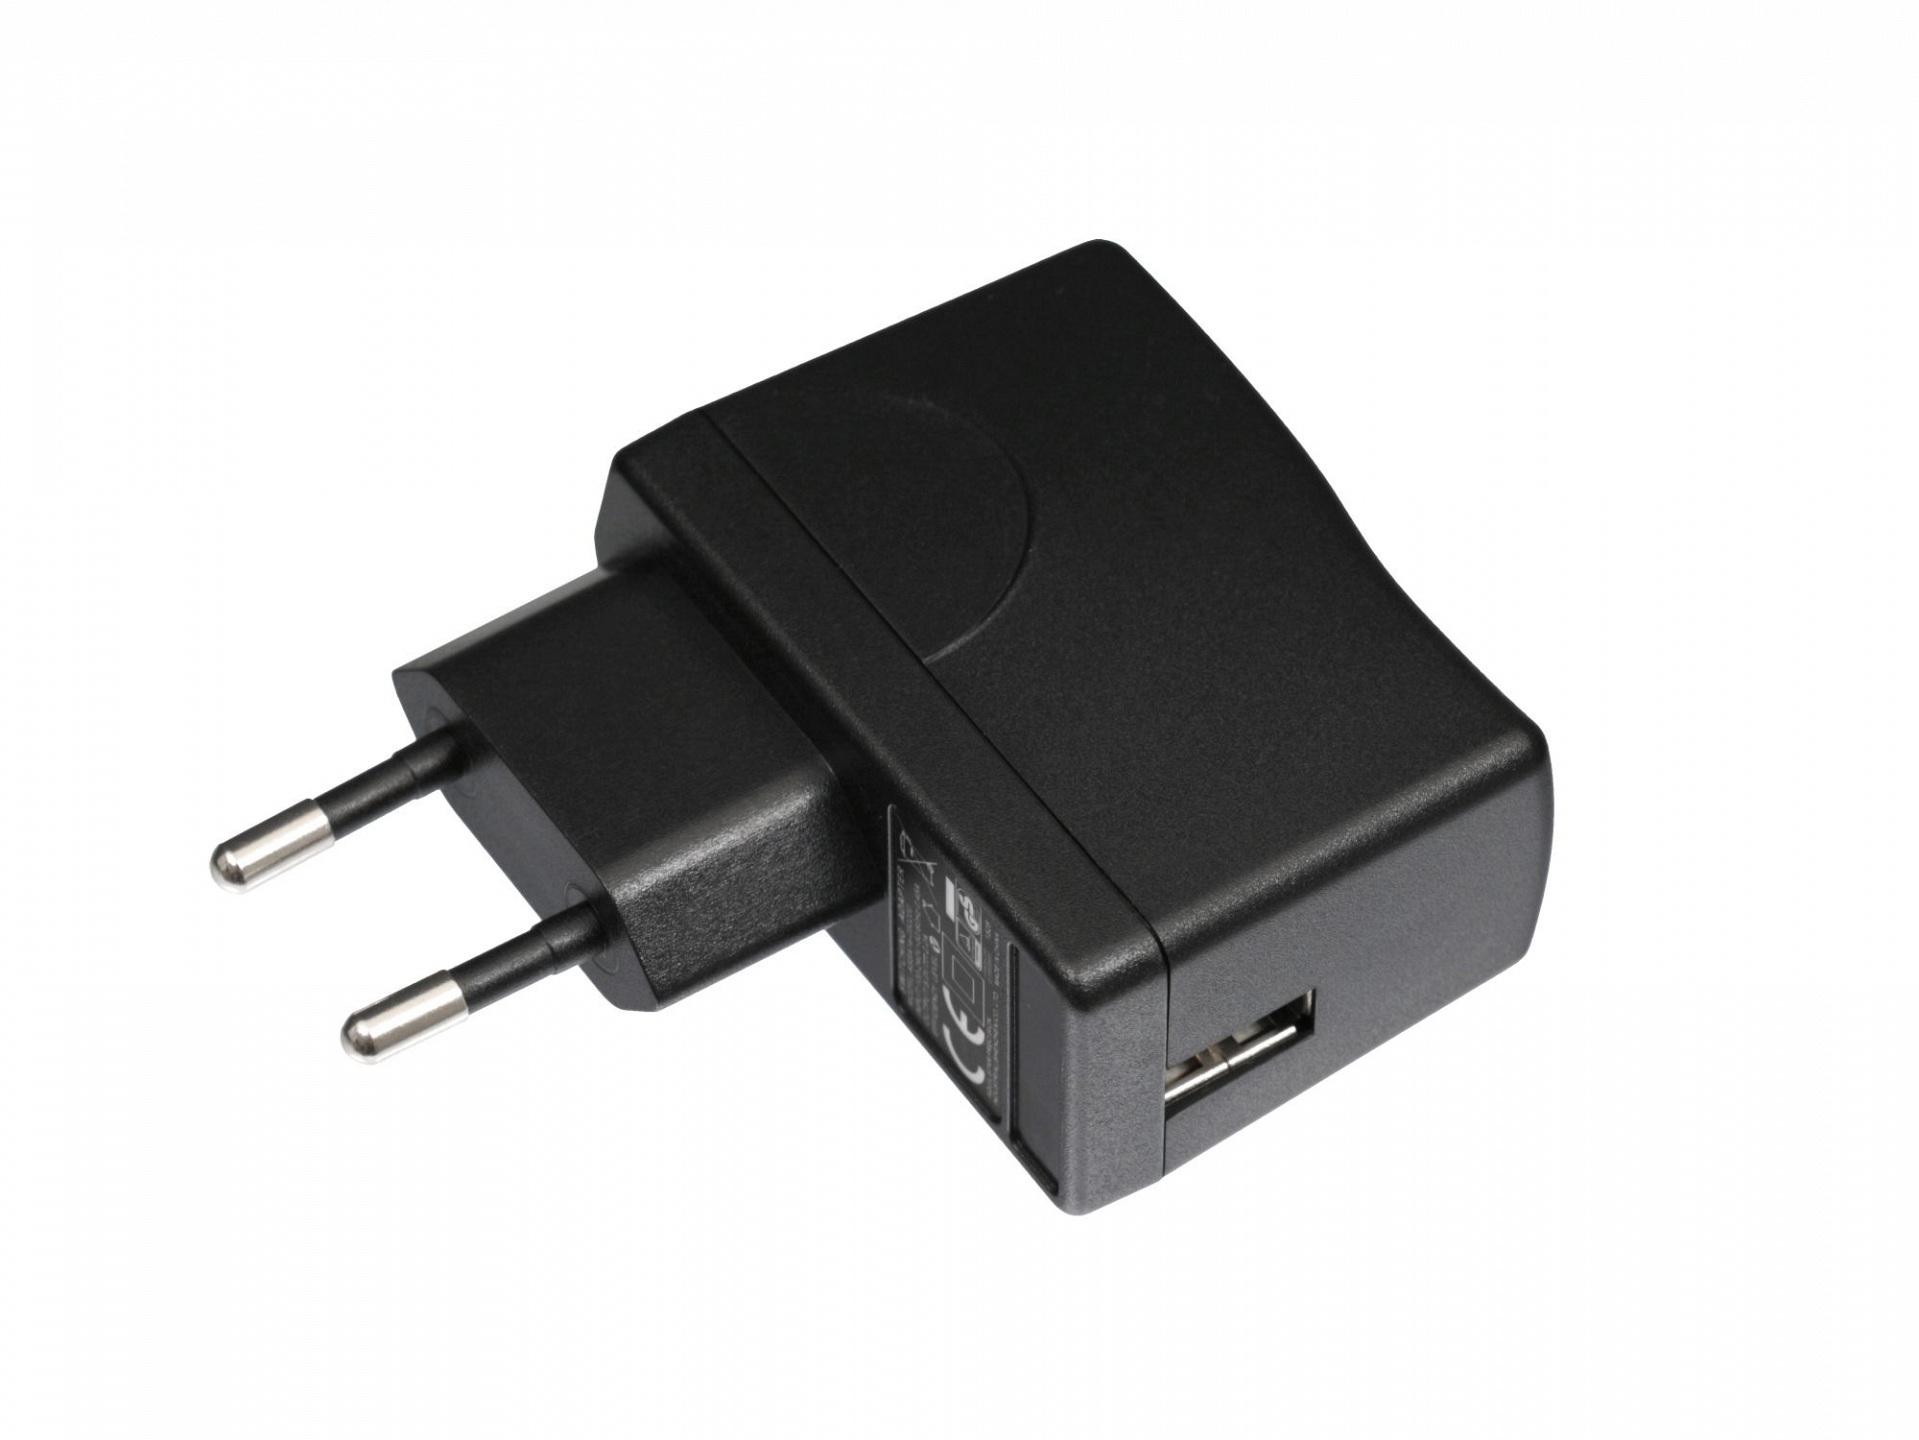 USB Netzteil 10 Watt EU Wallplug für Medion Lifetab E7316 Serie